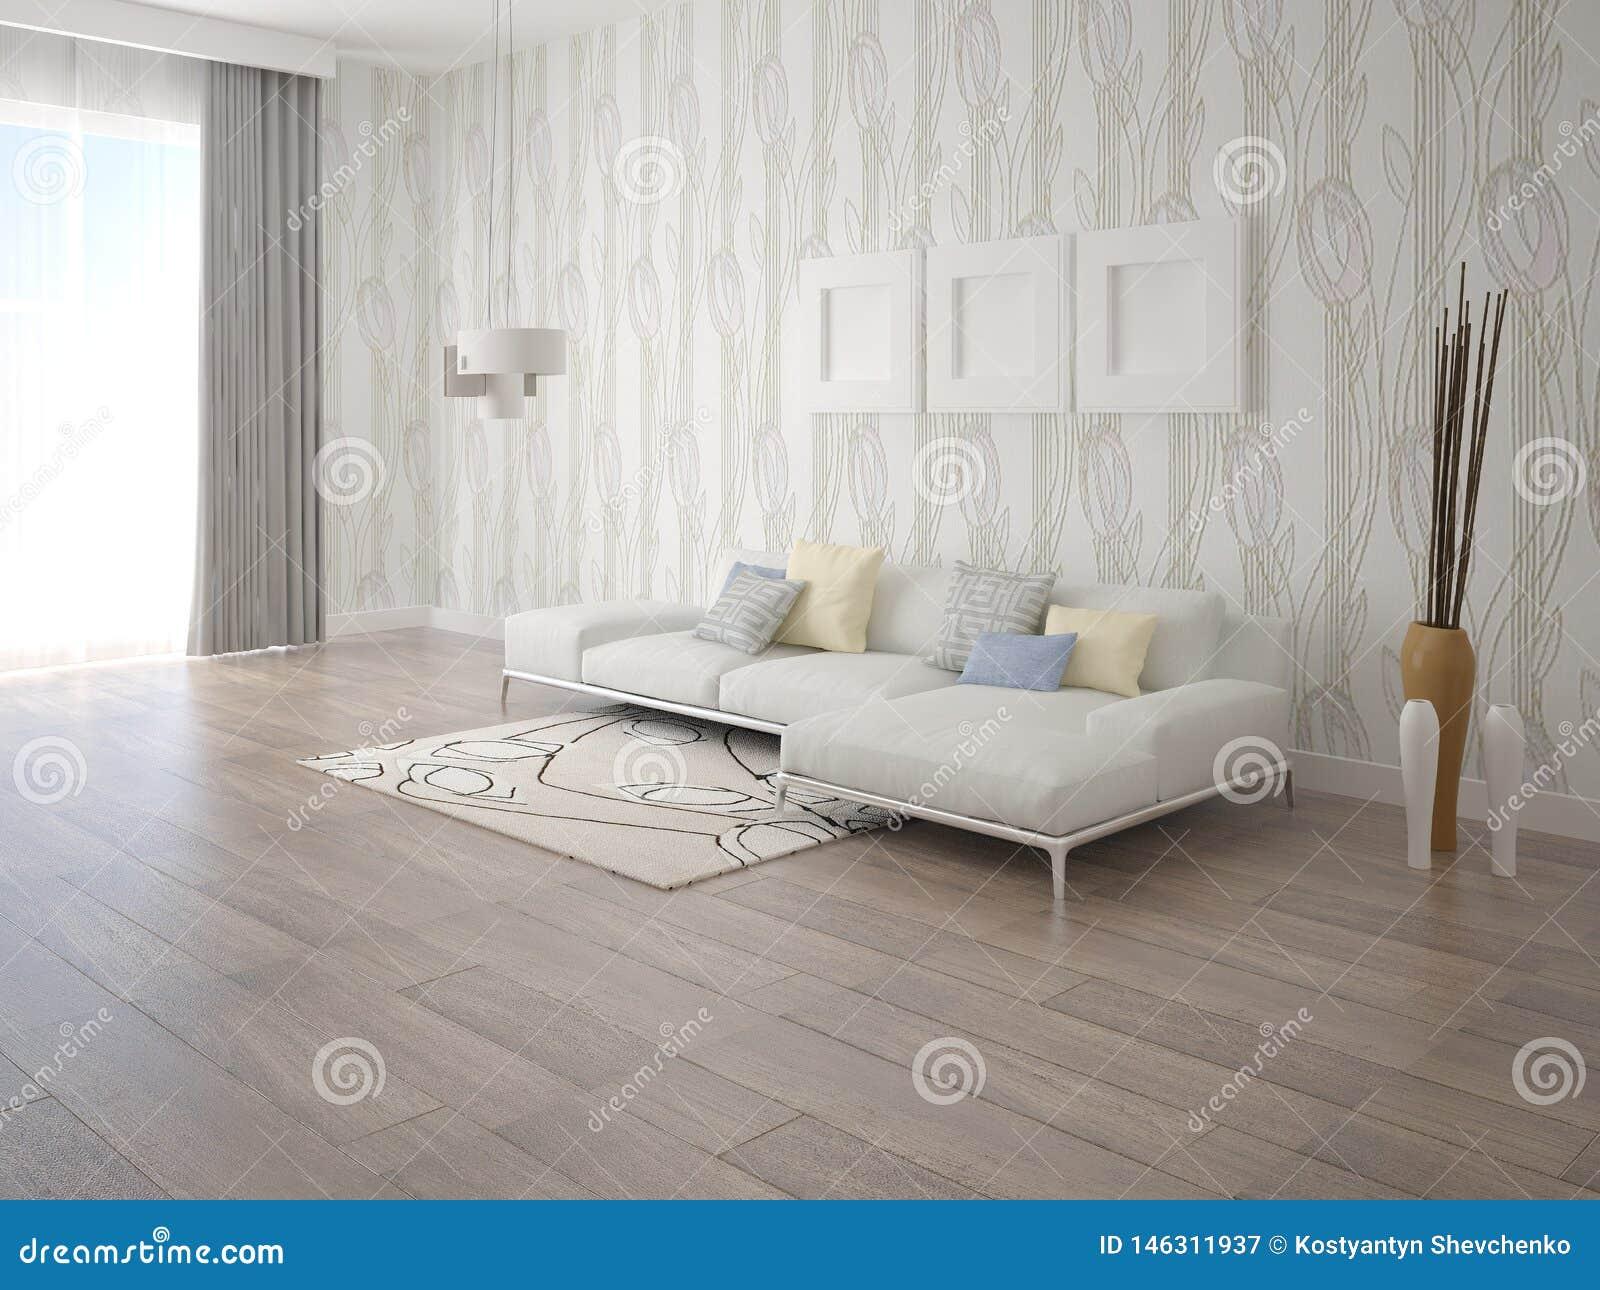 Mock Up Modern Living Room With A Stylish Corner Sofa Stock Illustration Illustration Of Life Picture 146311937,Rabbit Rabbit Rabbit Designs Dresses